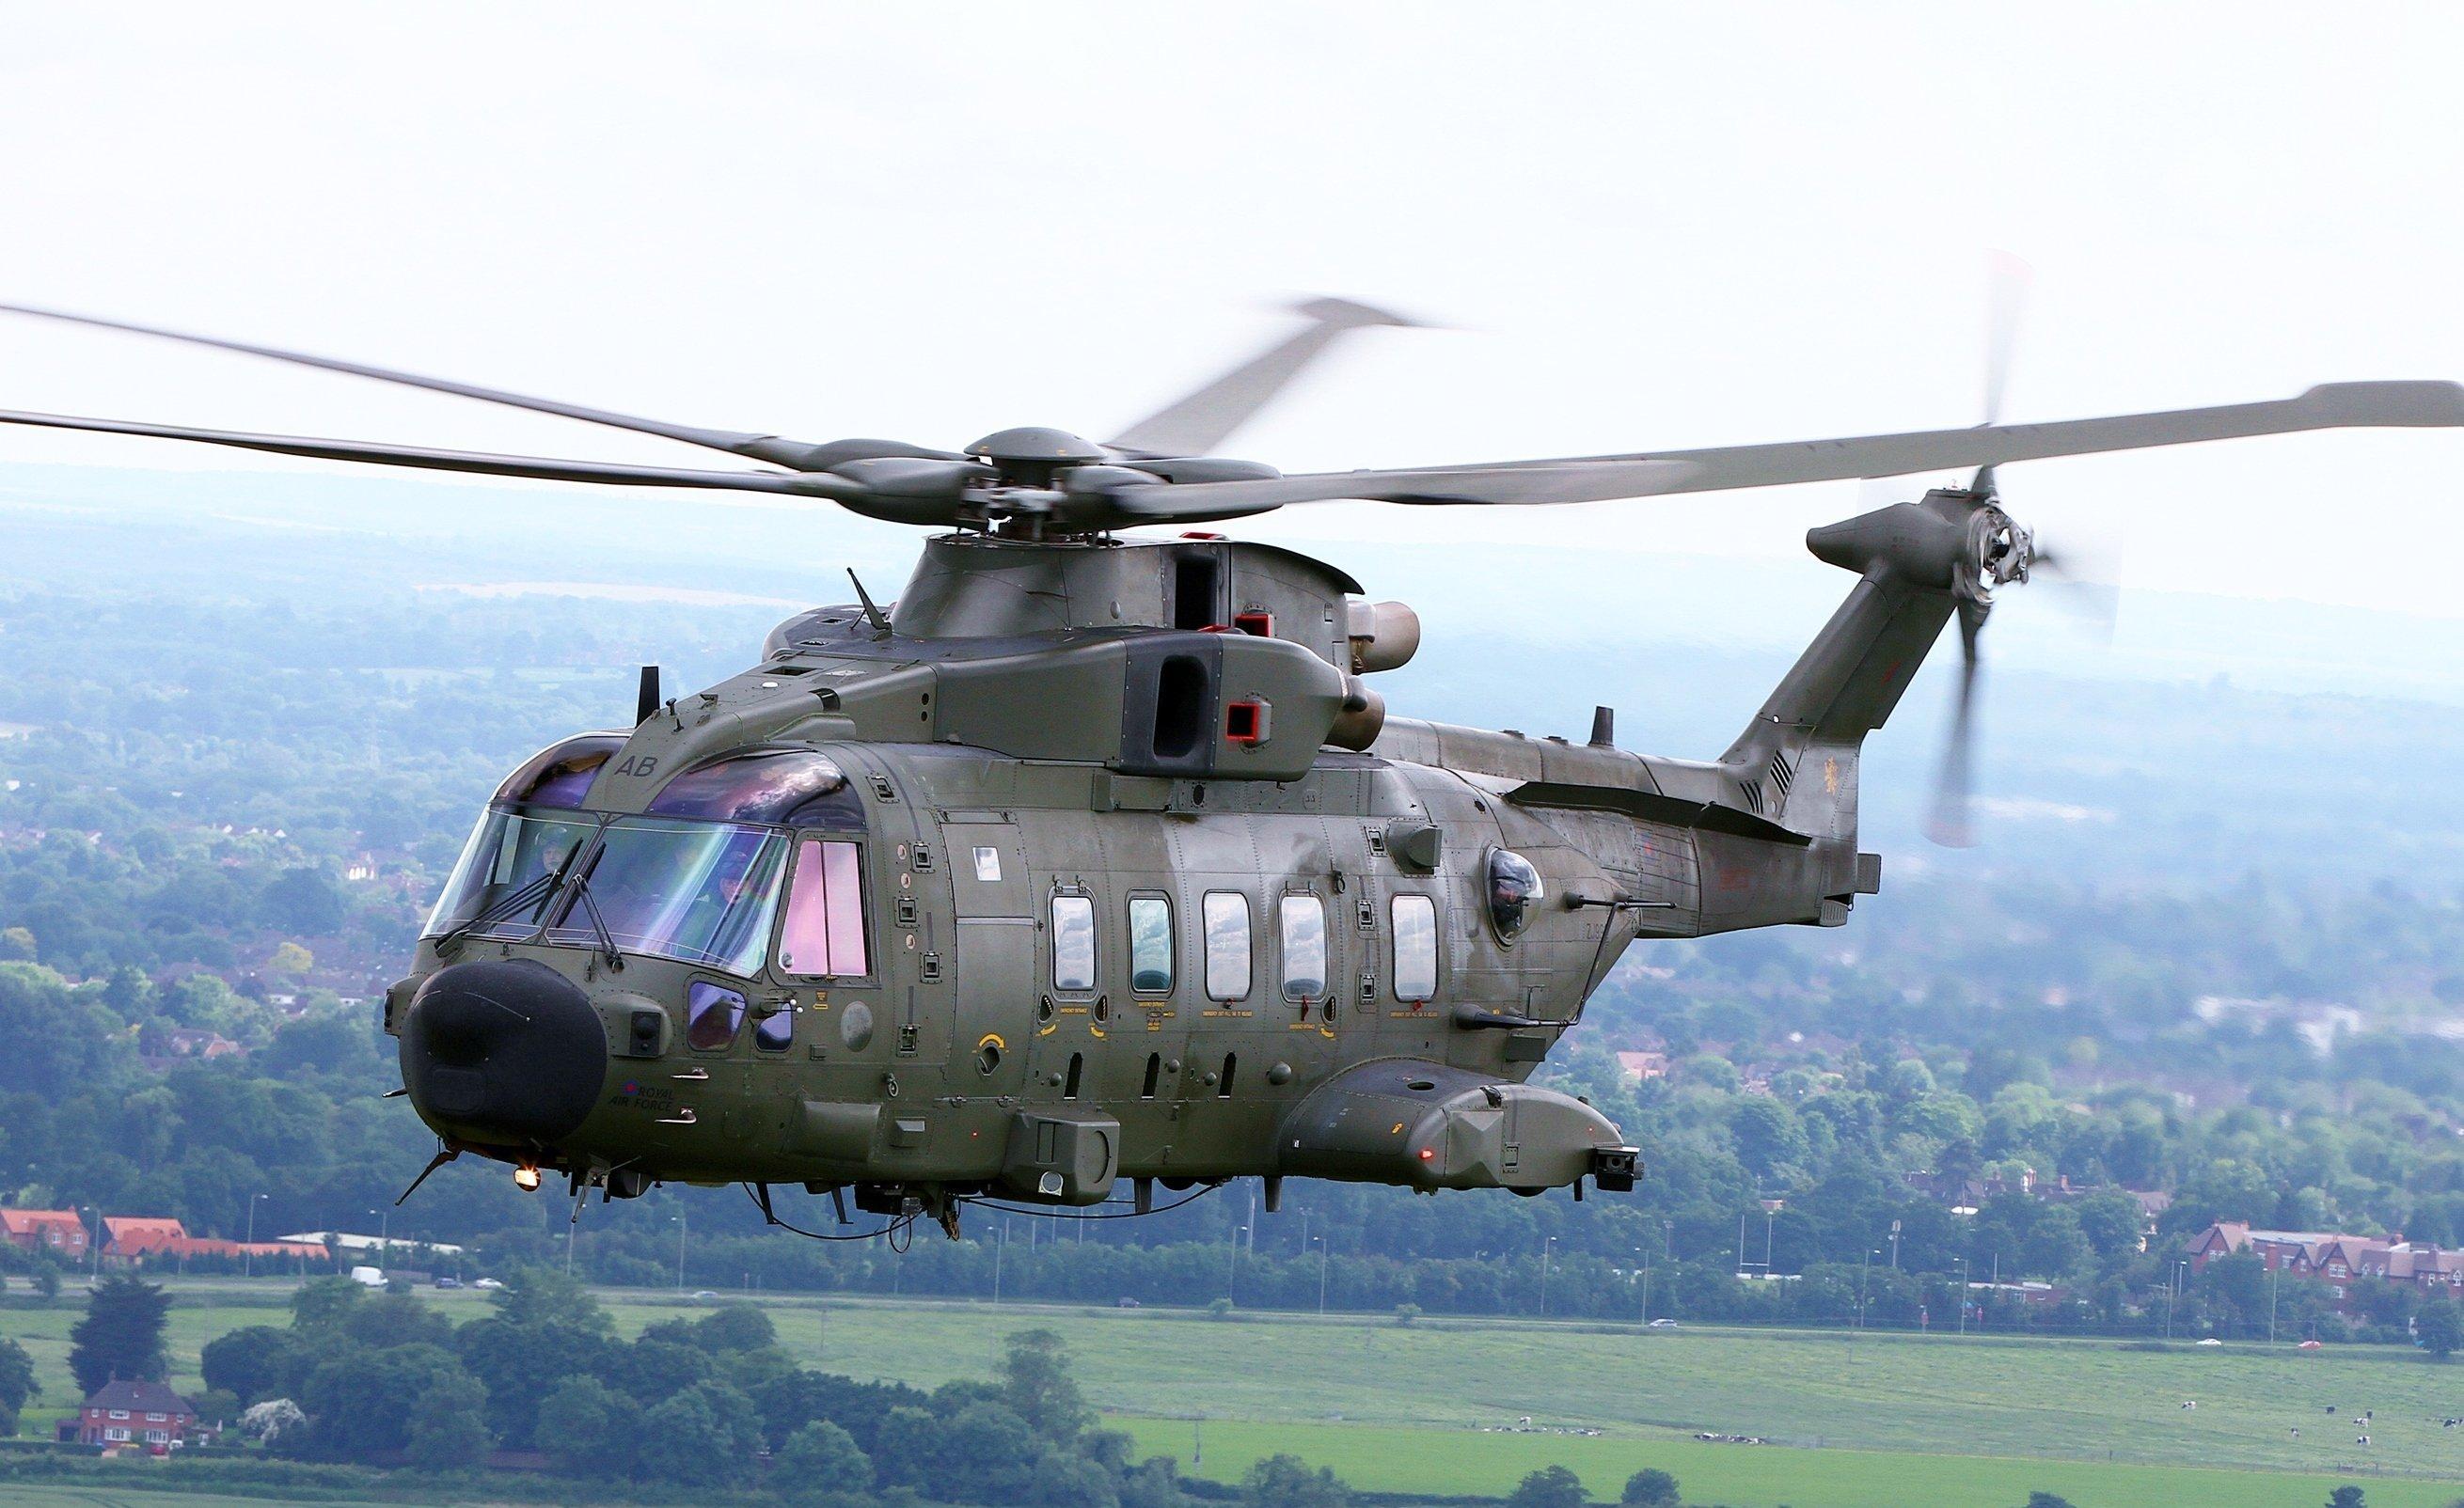 Un hélicoptère britannique Merlin